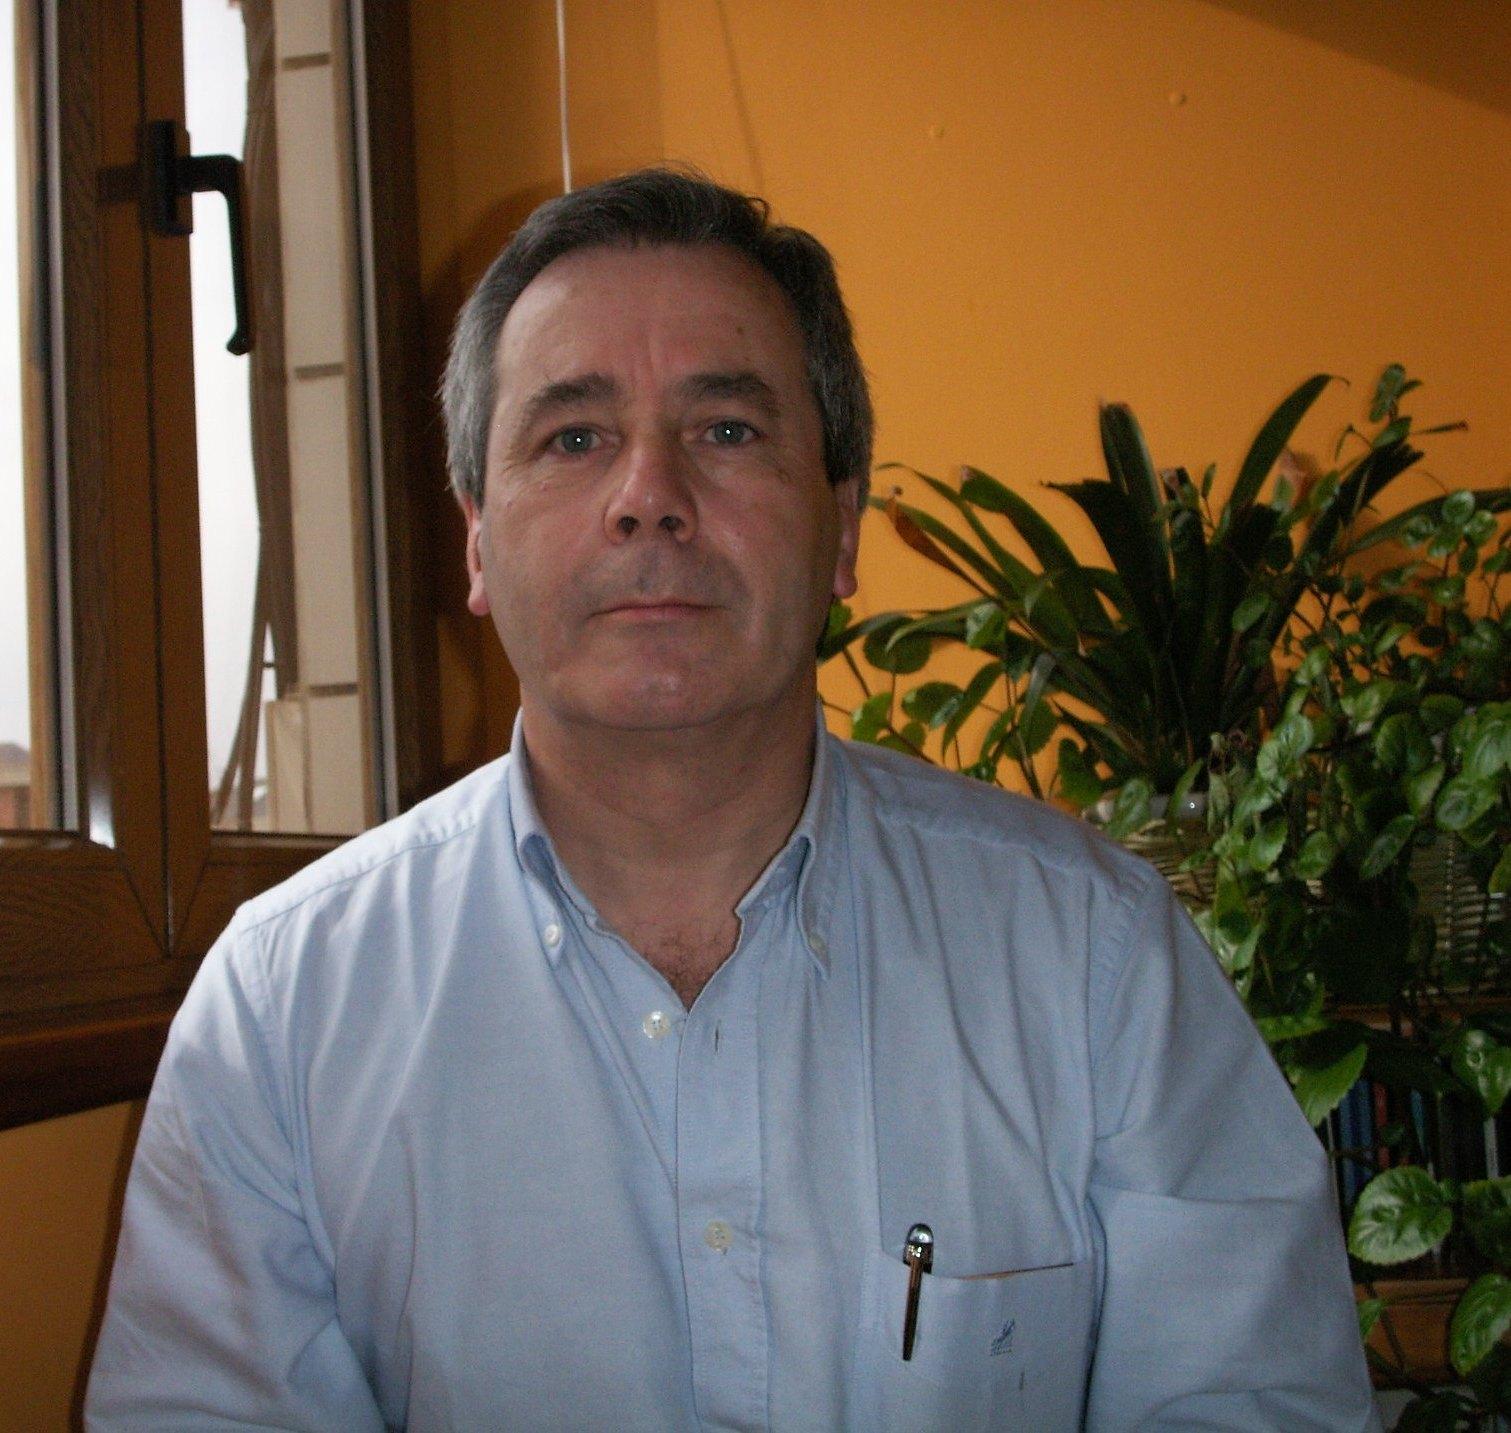 fernando rodriguez: